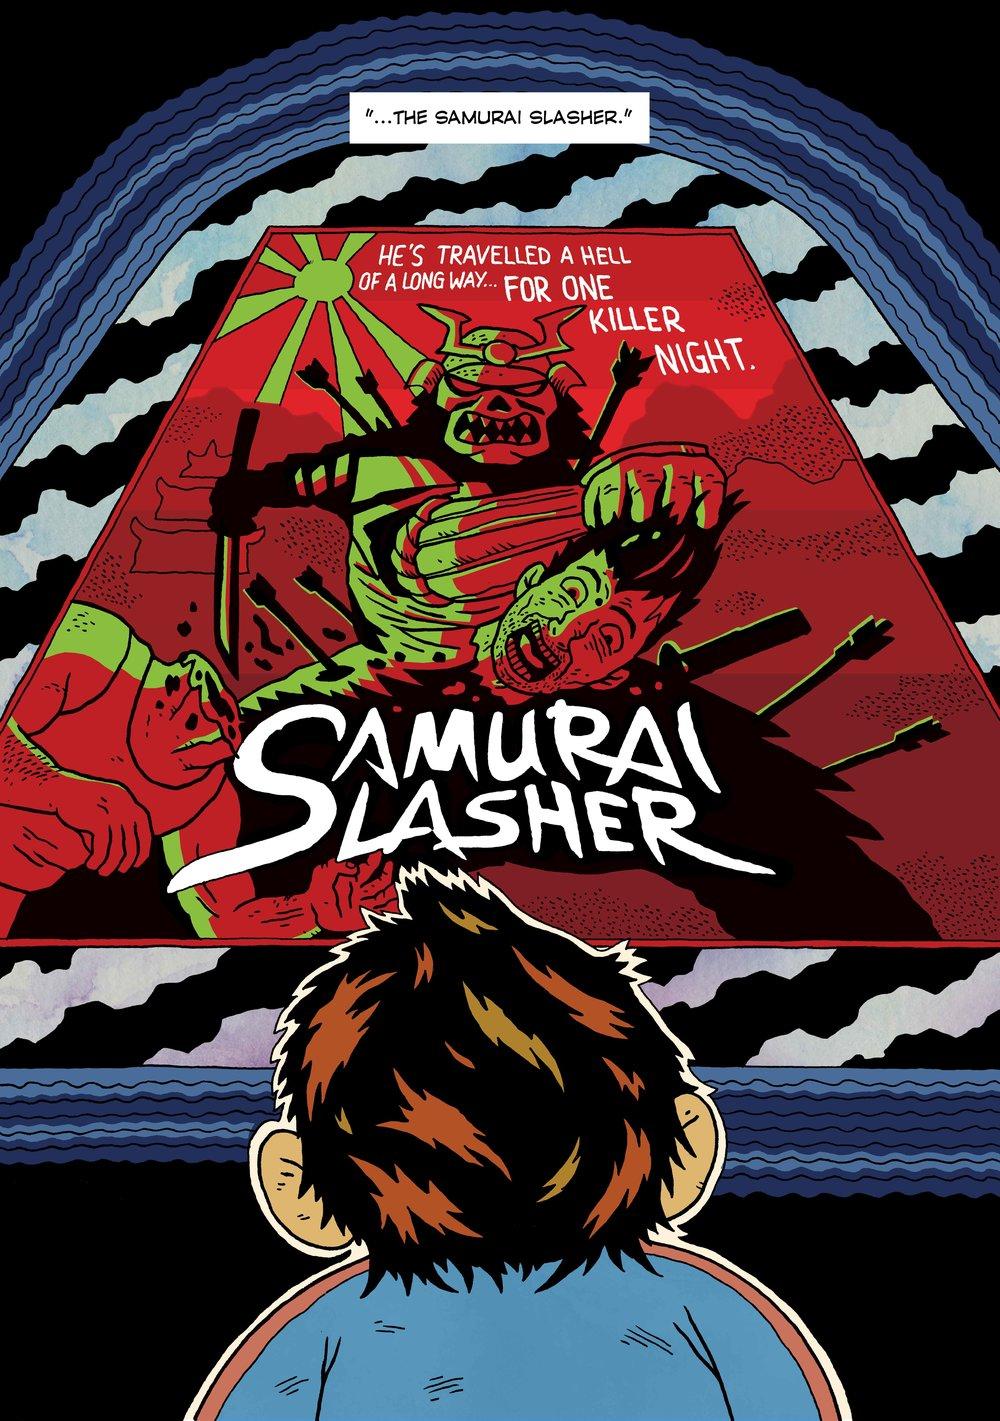 TXT_samurai-slasher_ink_03.jpg